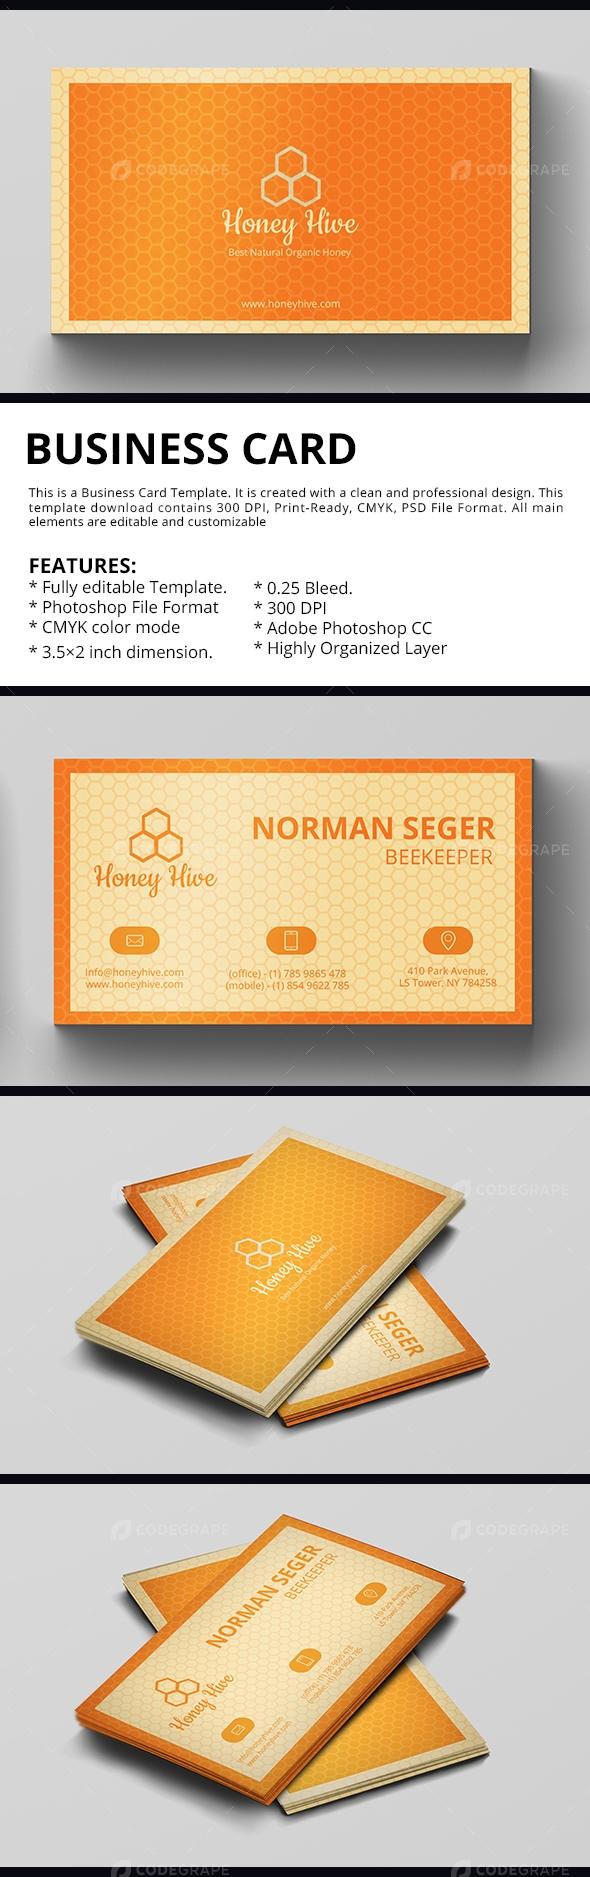 Bee Keeper Business Card